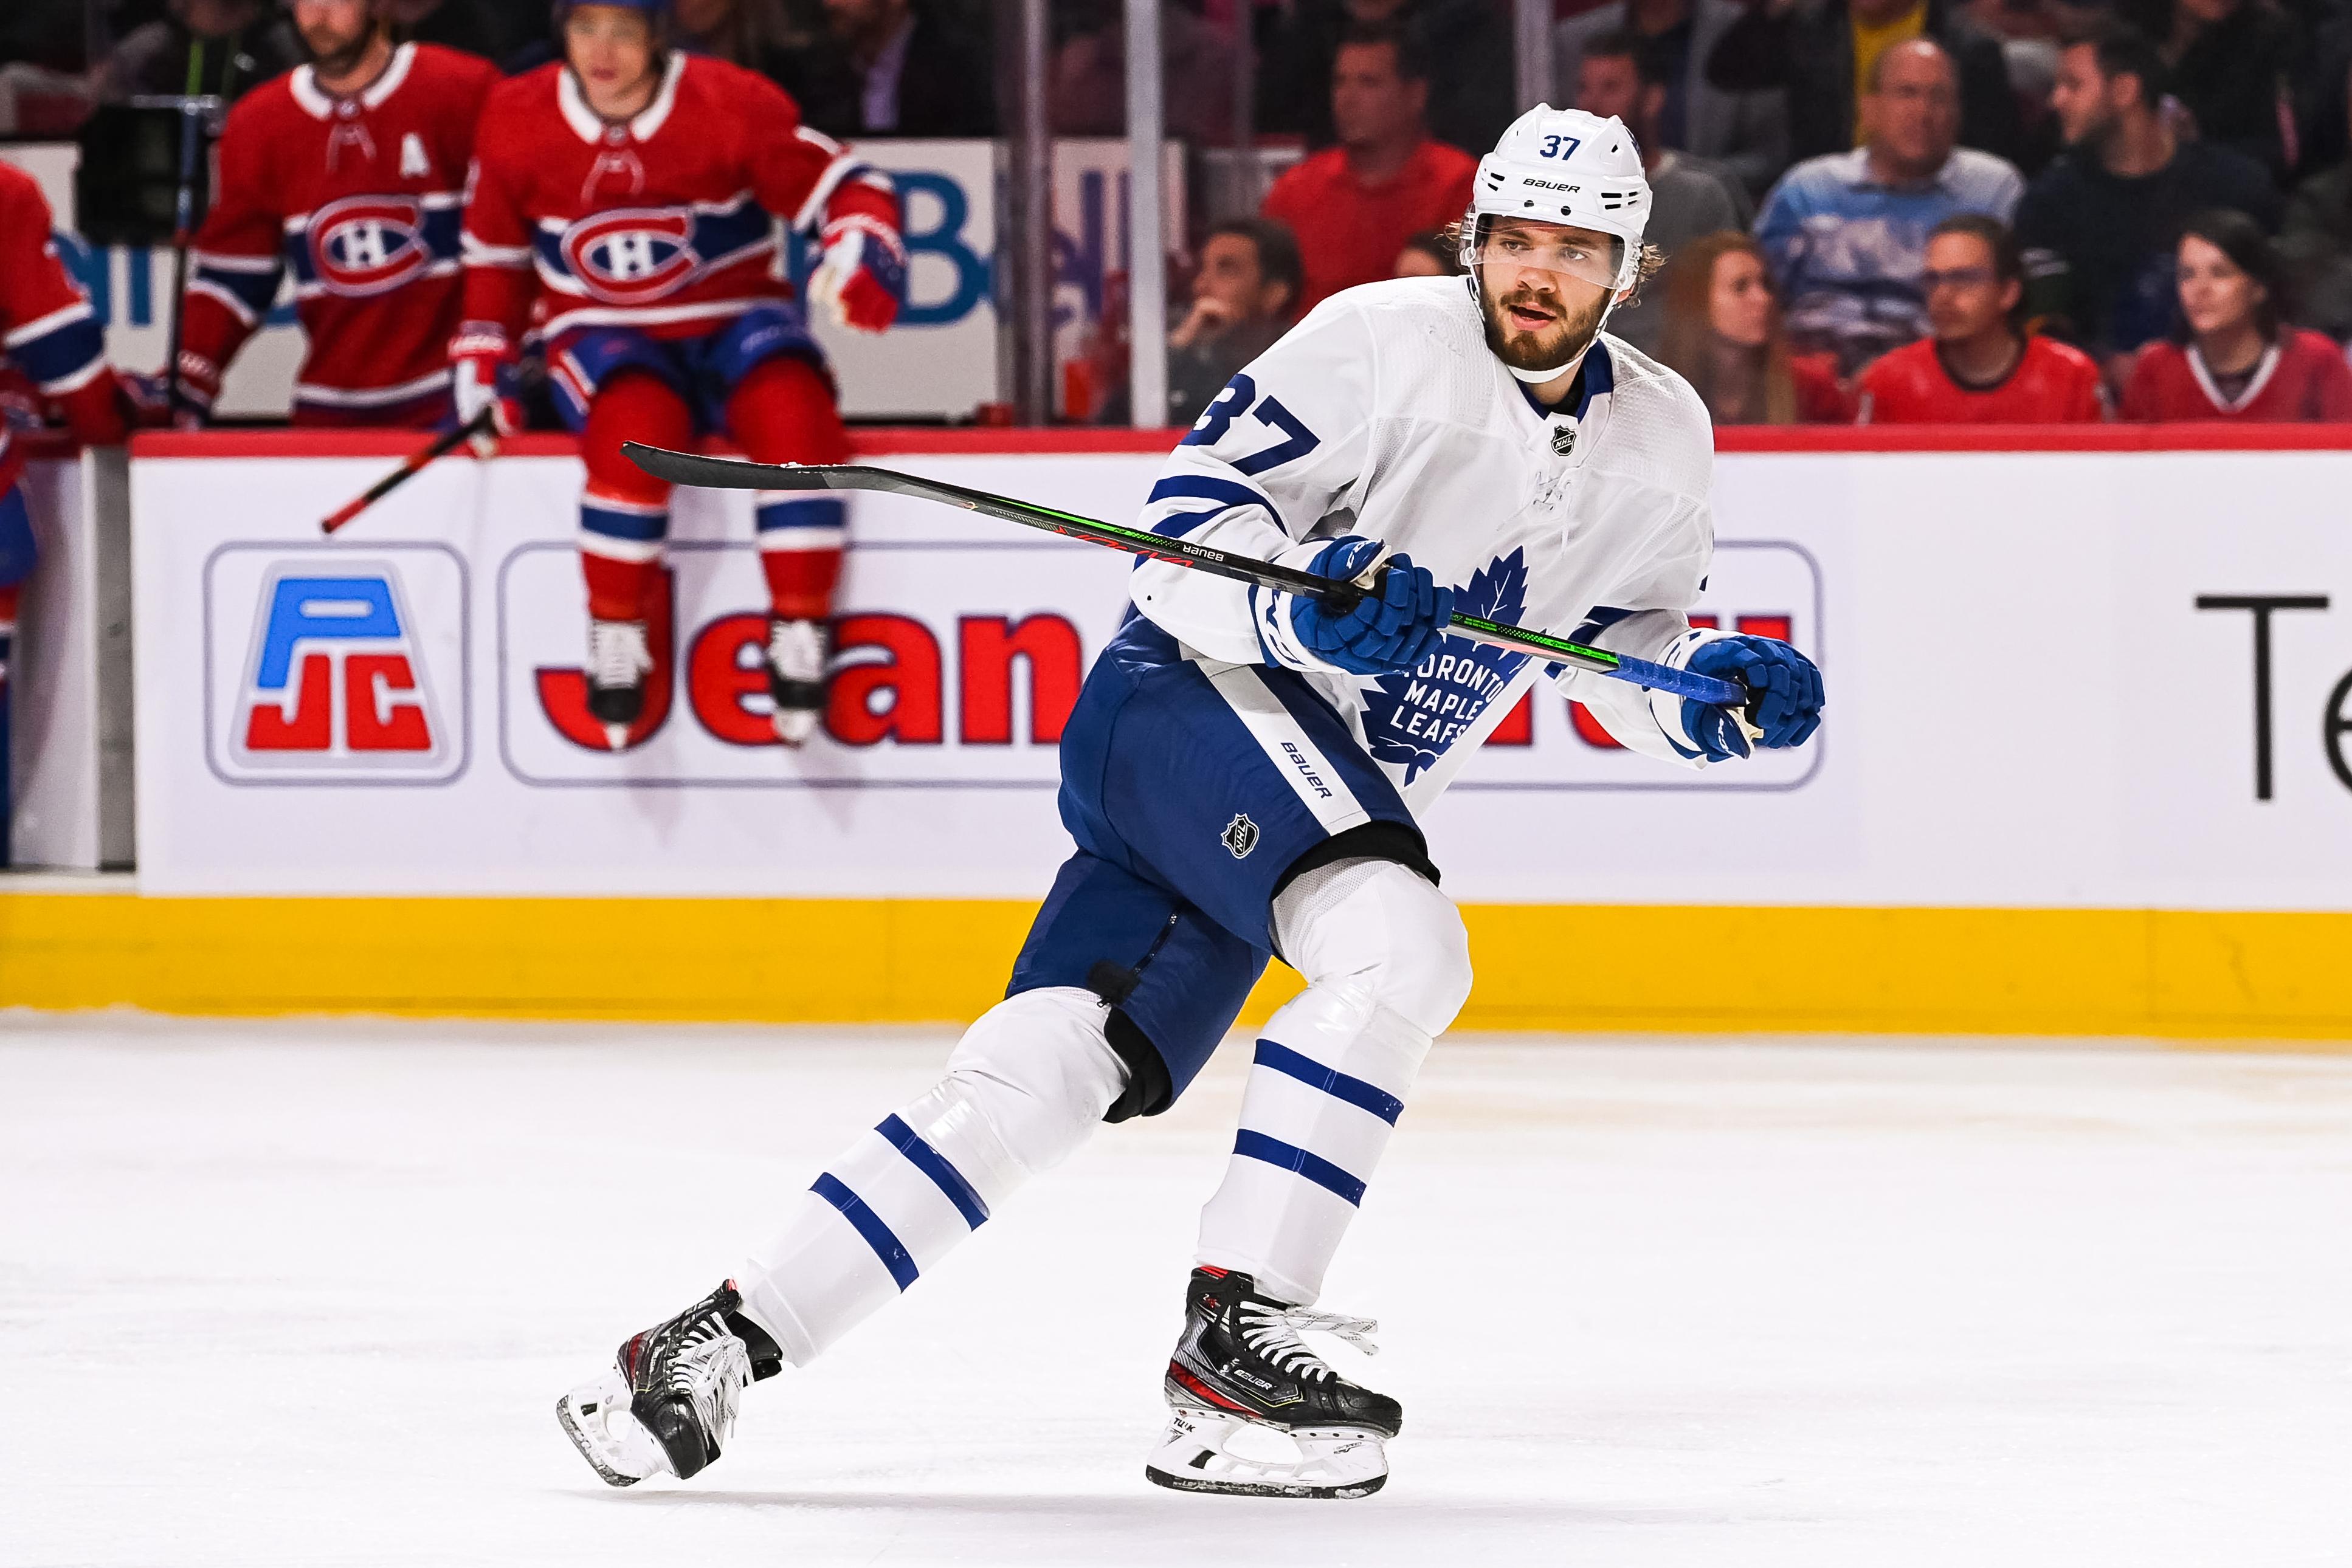 NHL: SEP 23 Preseason - Maple Leafs at Canadiens